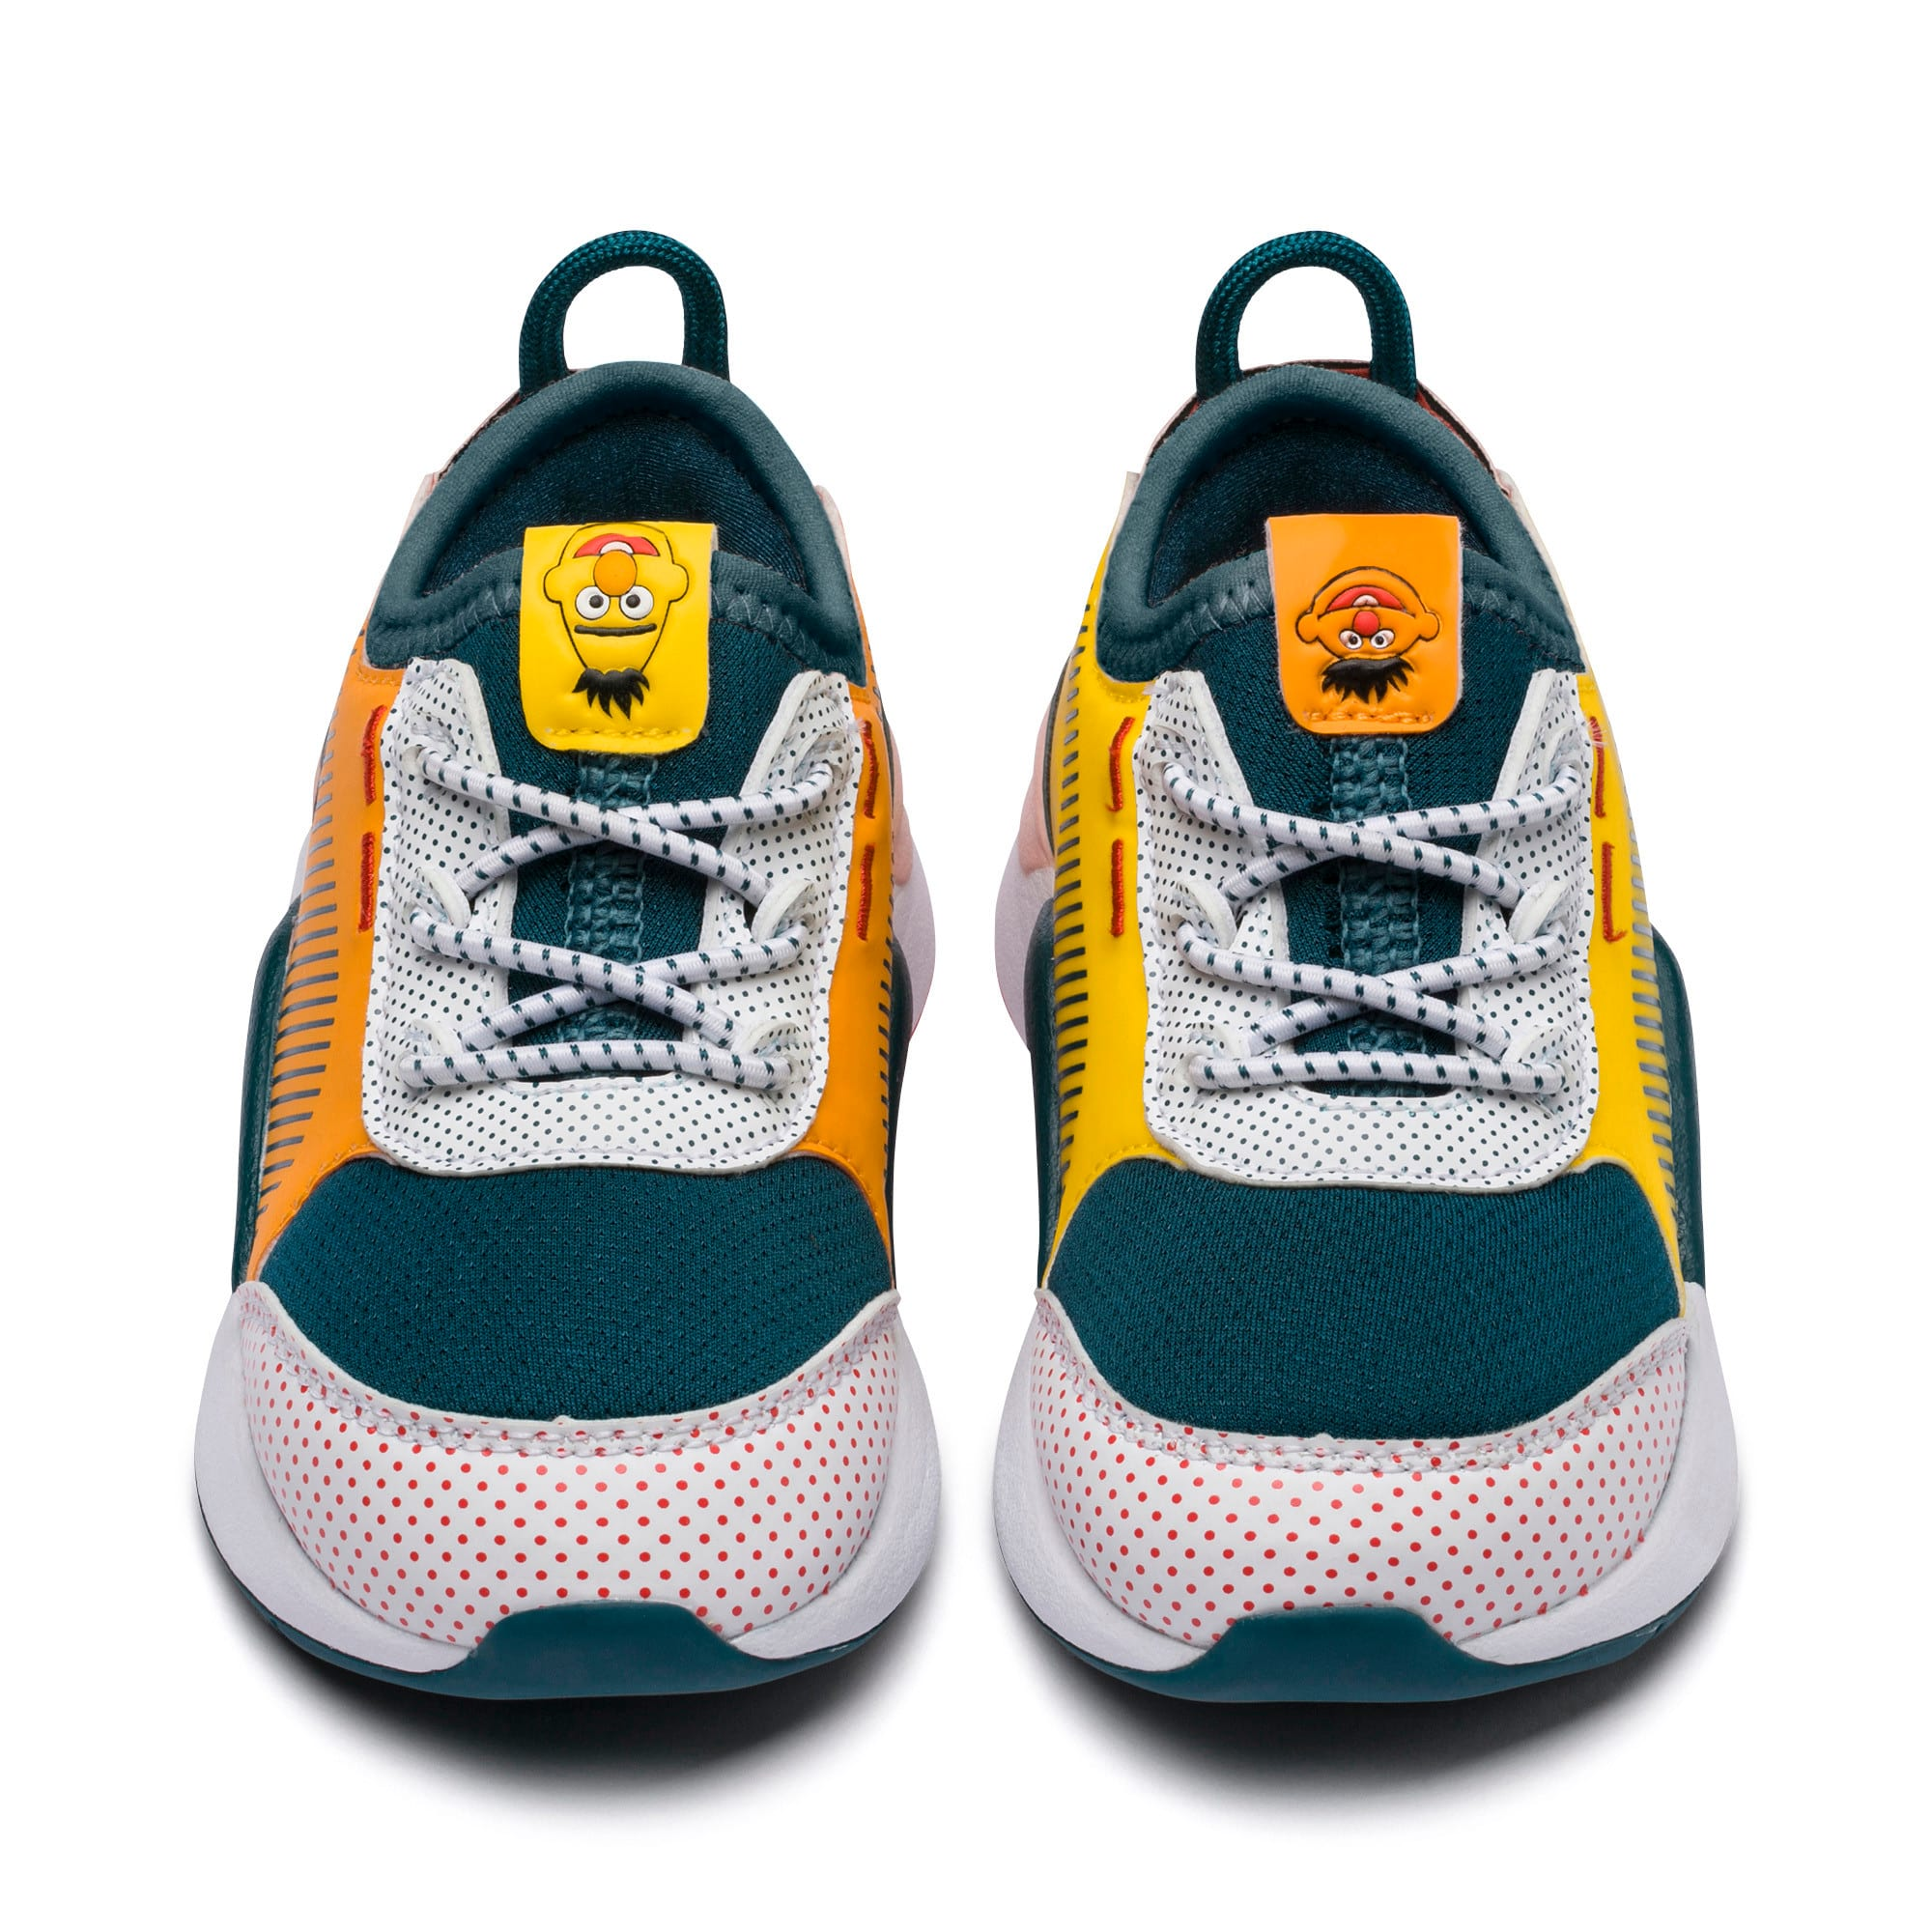 Thumbnail 7 of Sesame Street 50 RS-0 AC Toddler Shoes, Rose-BlueCoral-Dandelion, medium